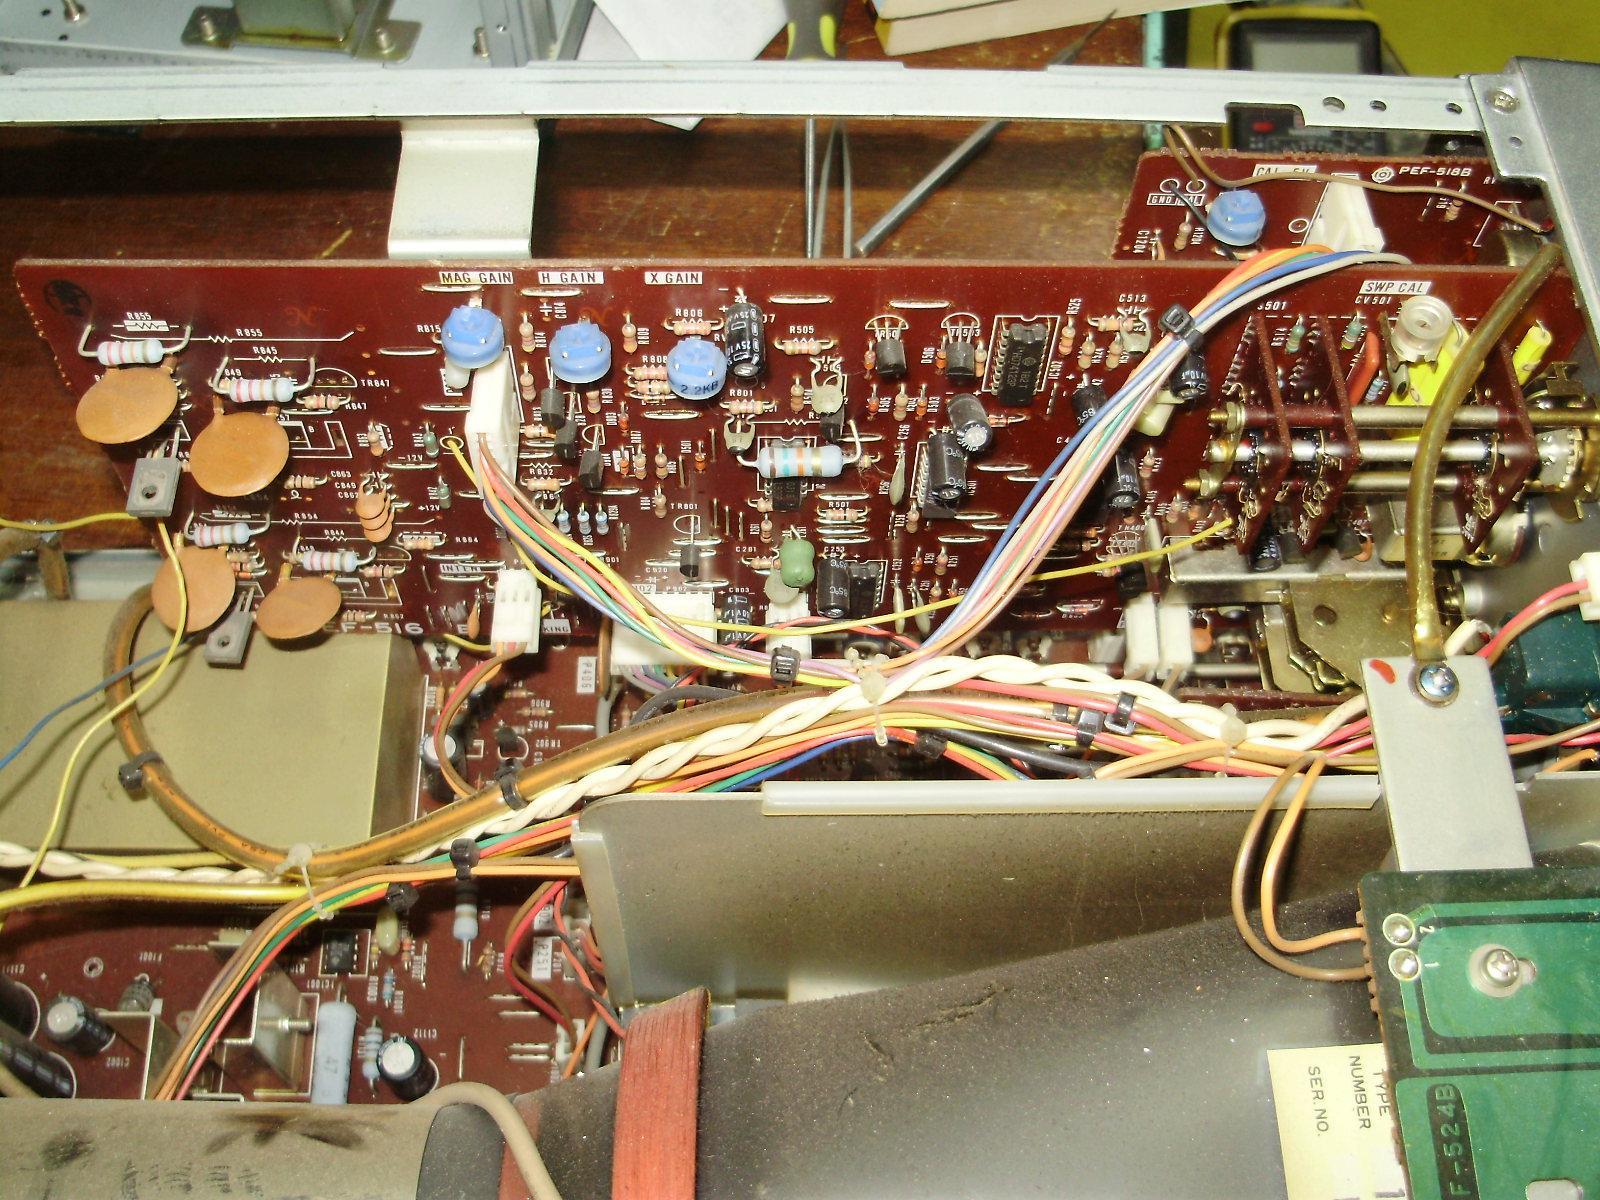 схема включения транзистора кт969а